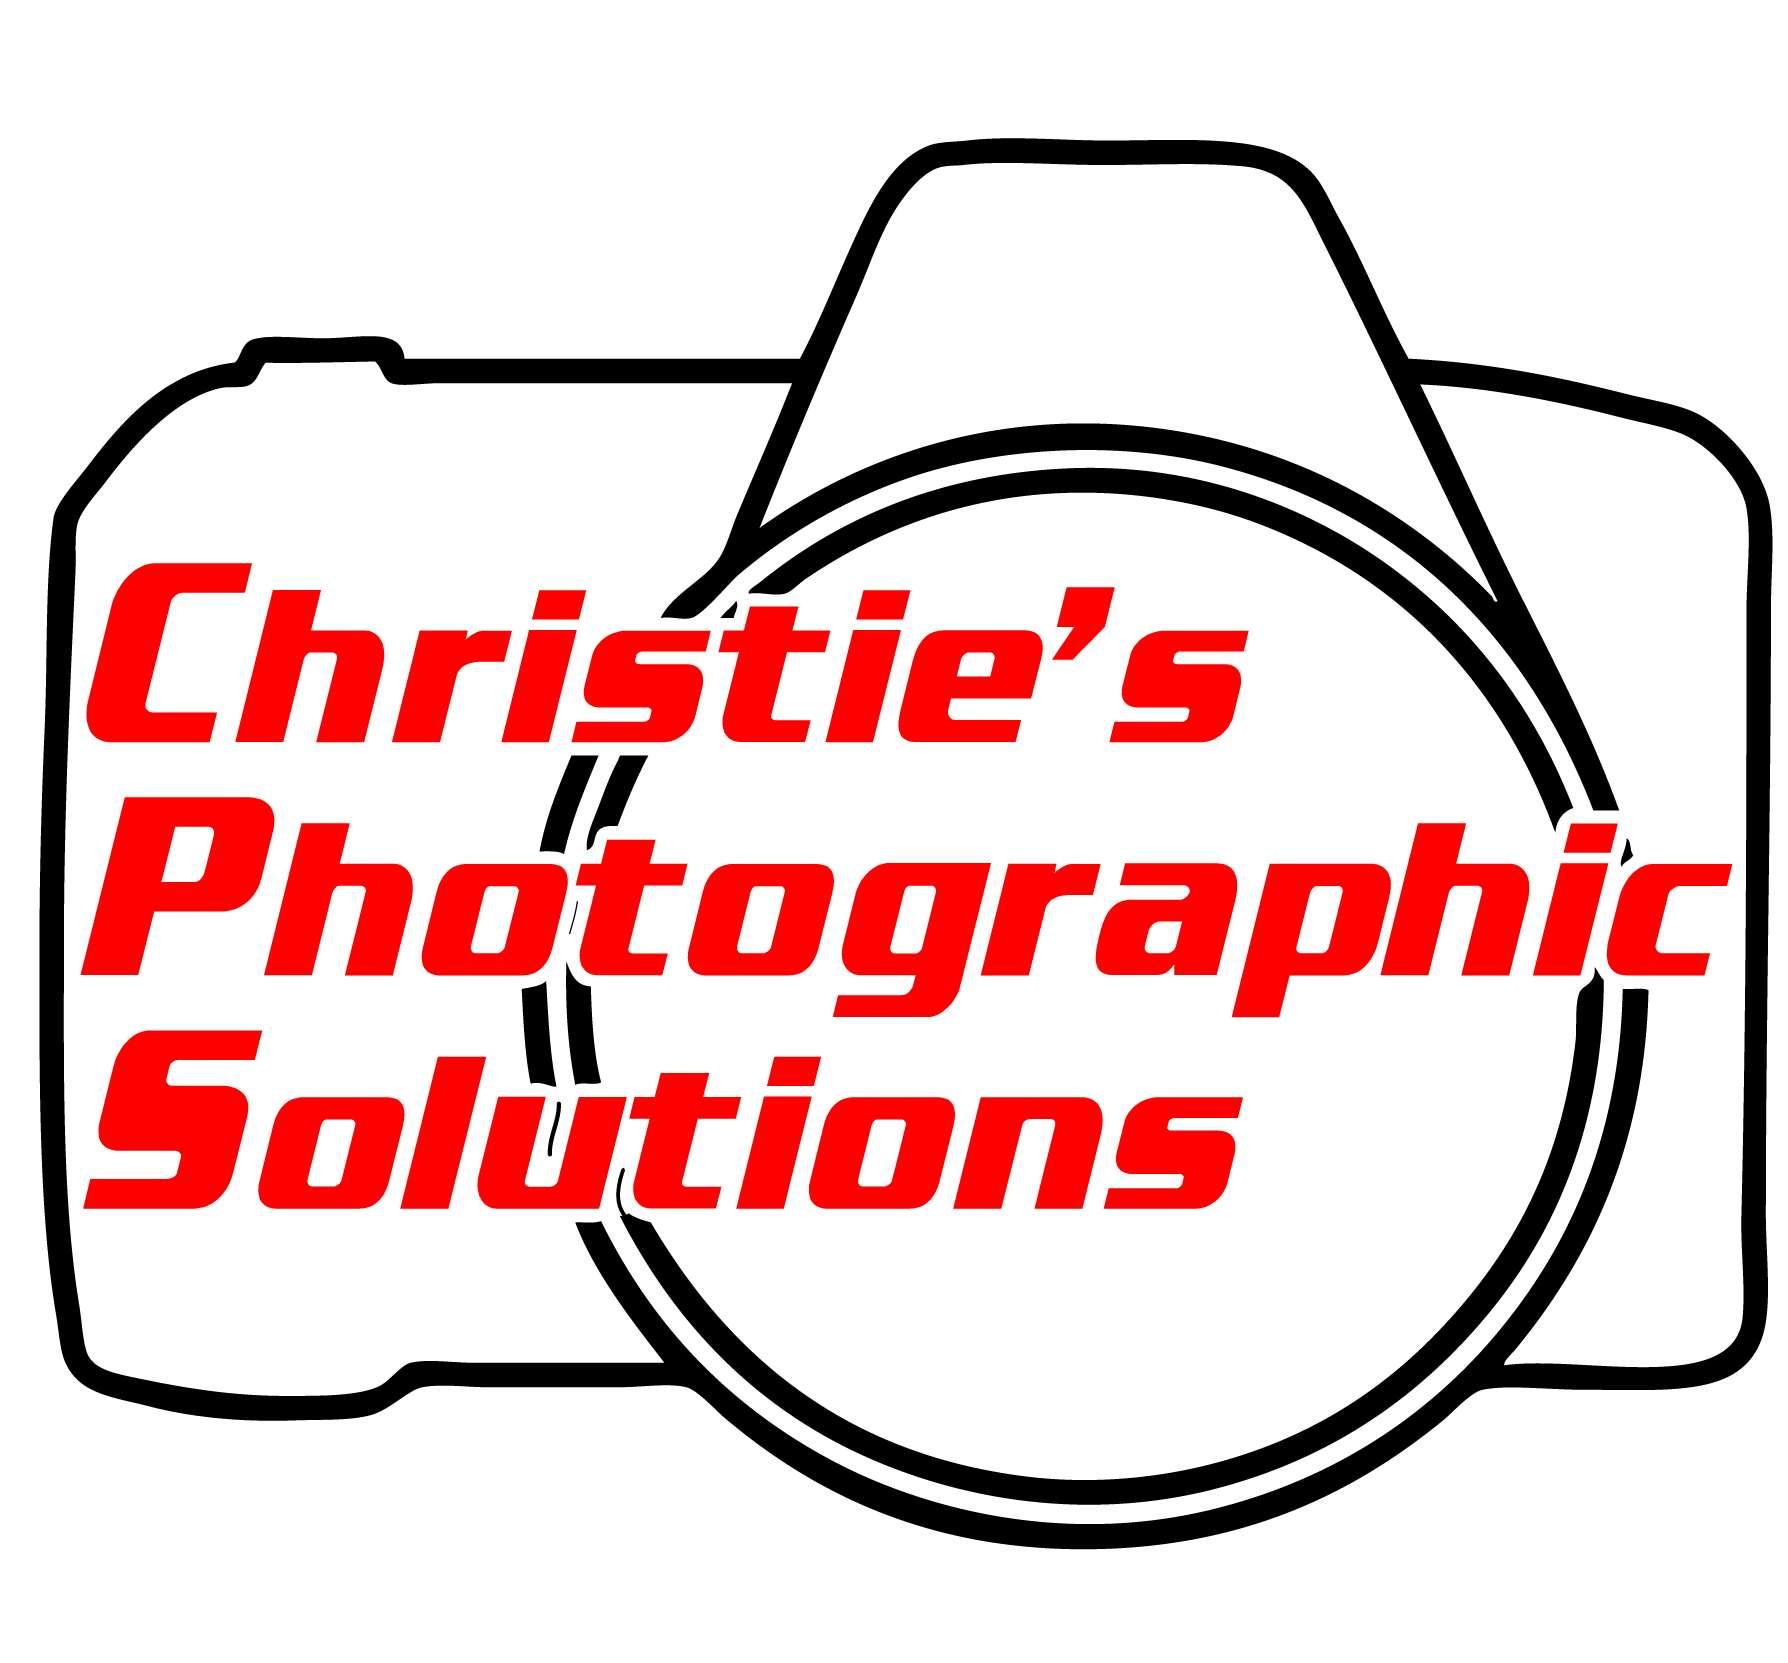 http://www.christiesphotographic.com/